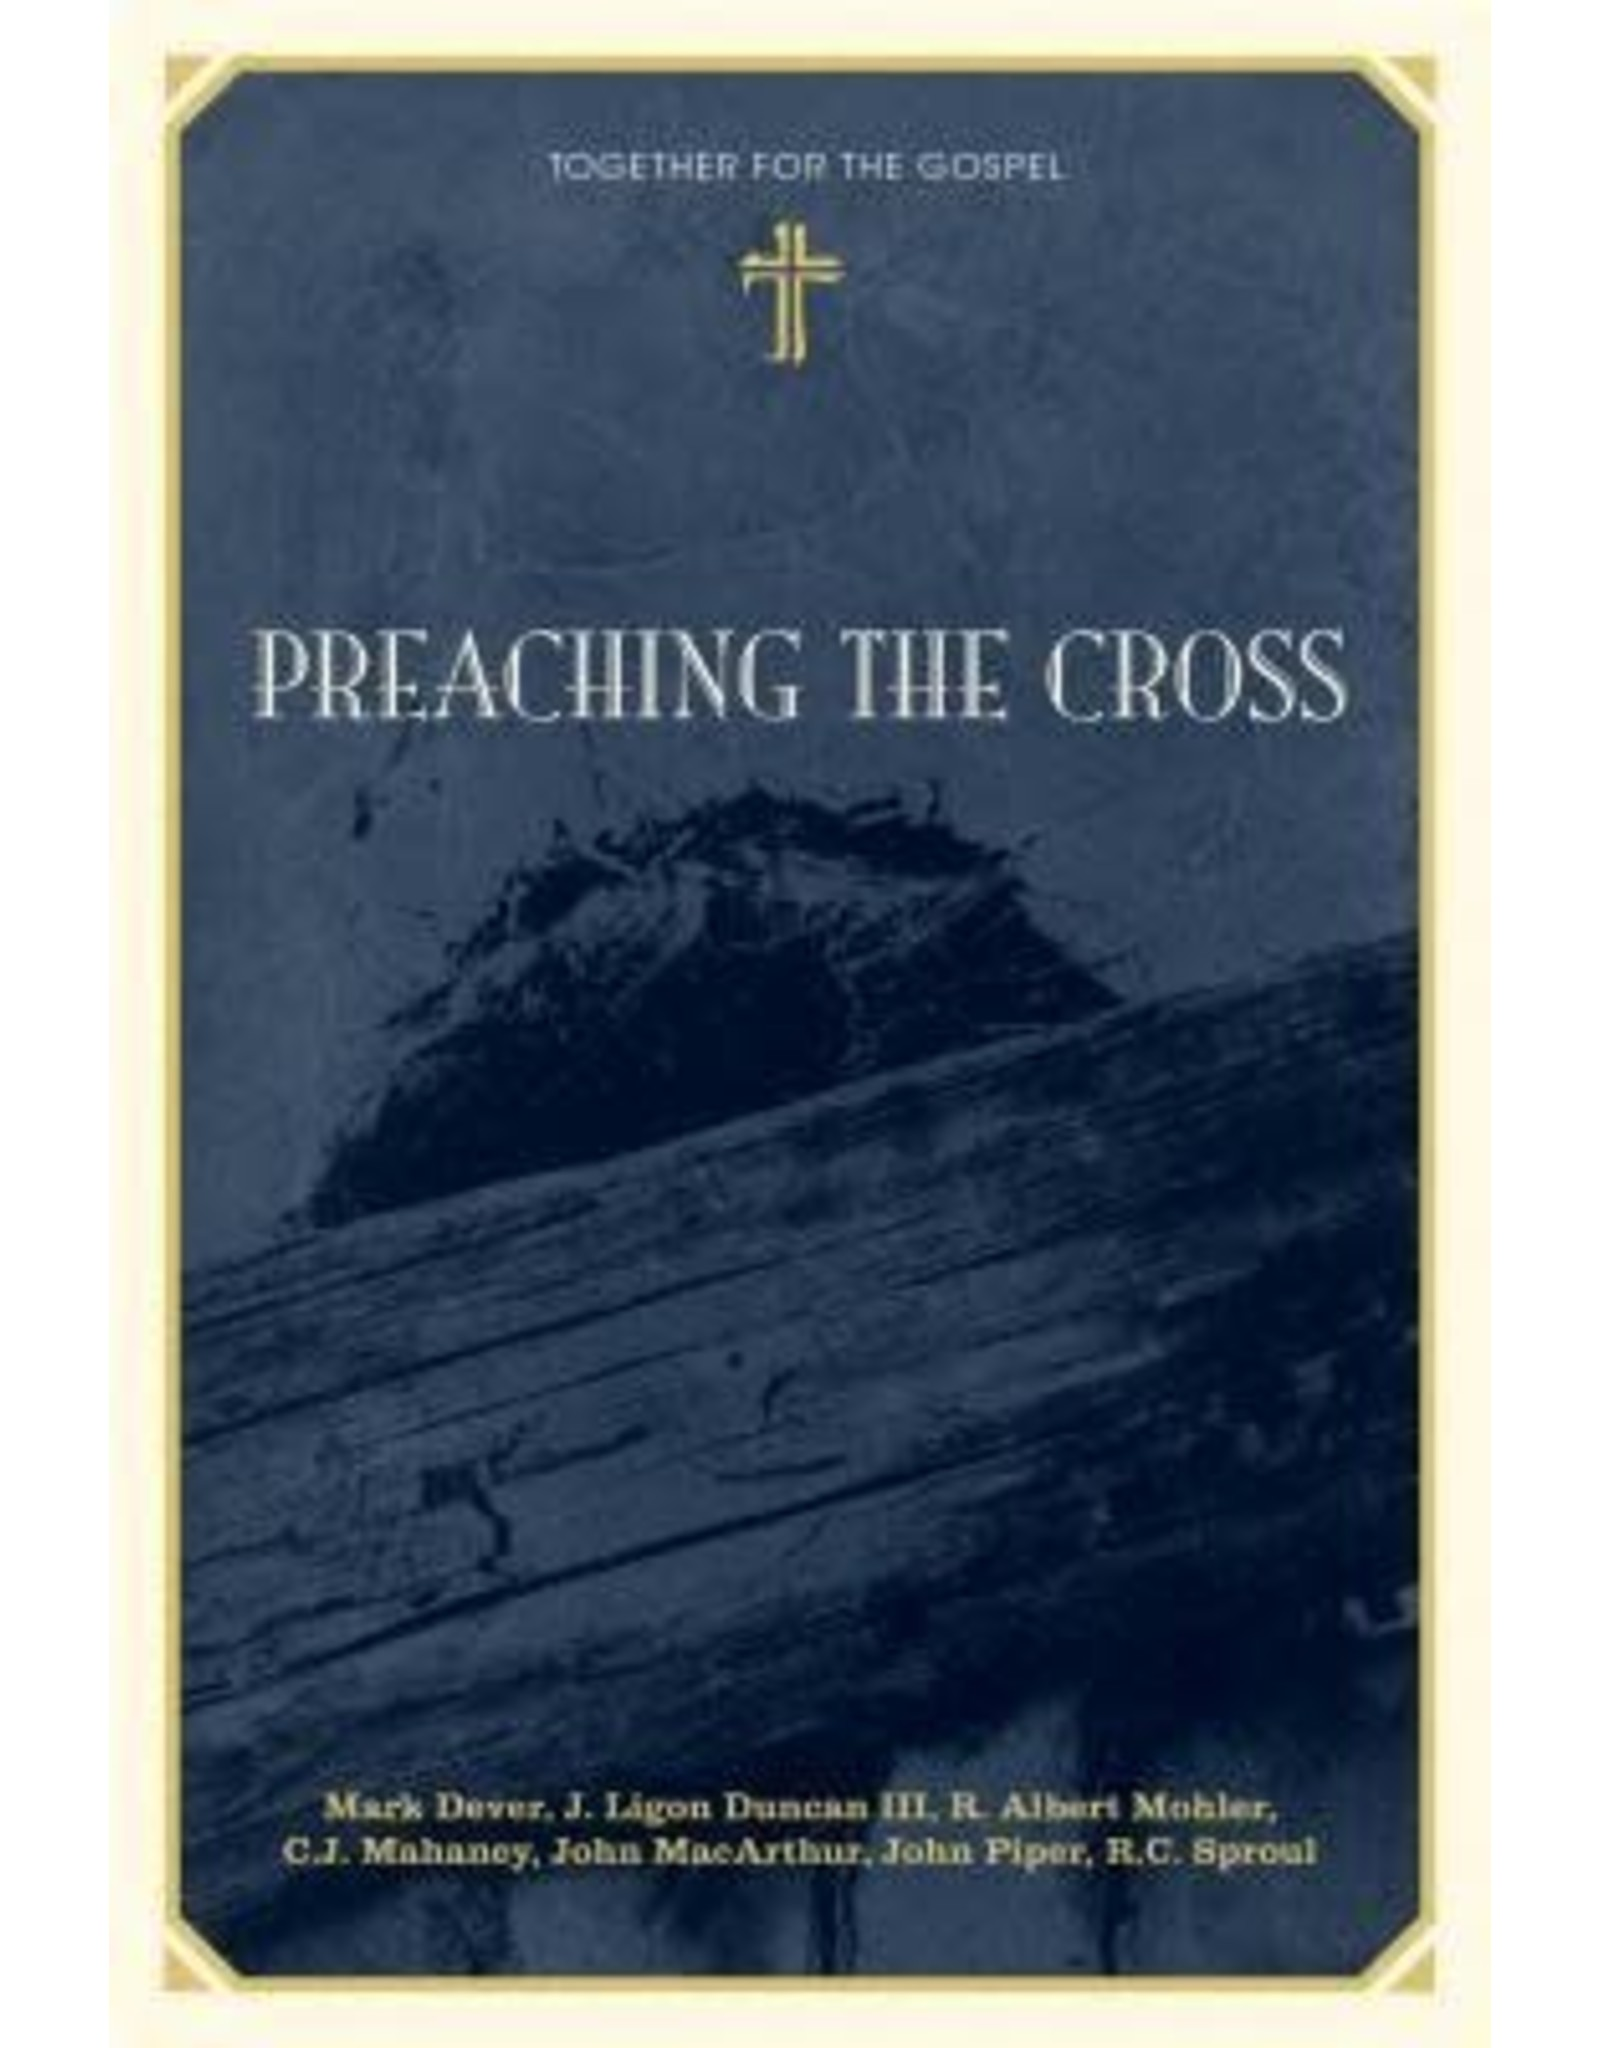 Dever Preaching the Cross